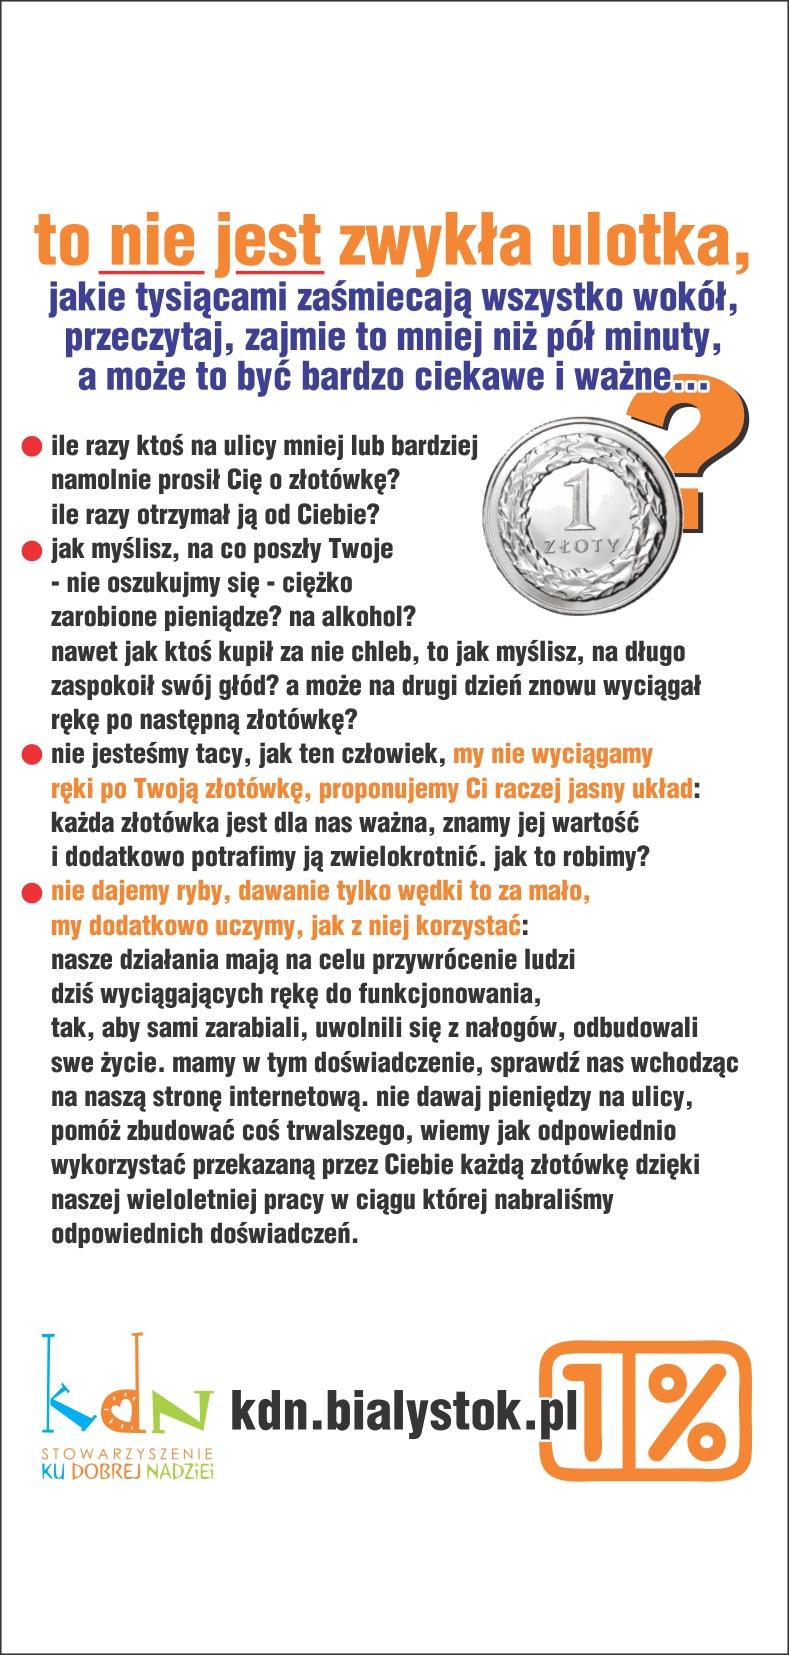 ulotka_1procent